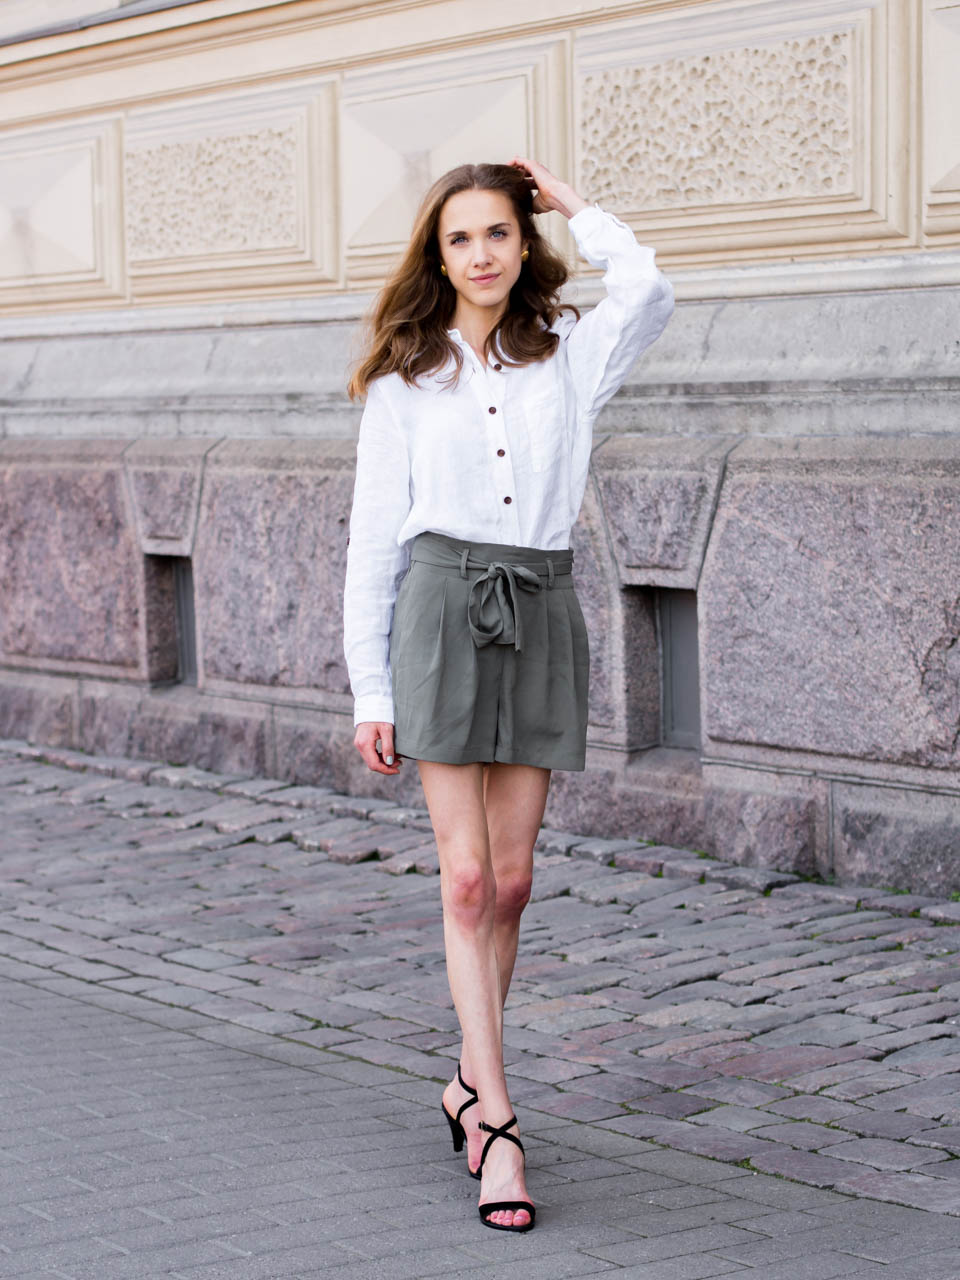 summer-trends-2019-safari-chic-linen-shirt-paperbag-shorts